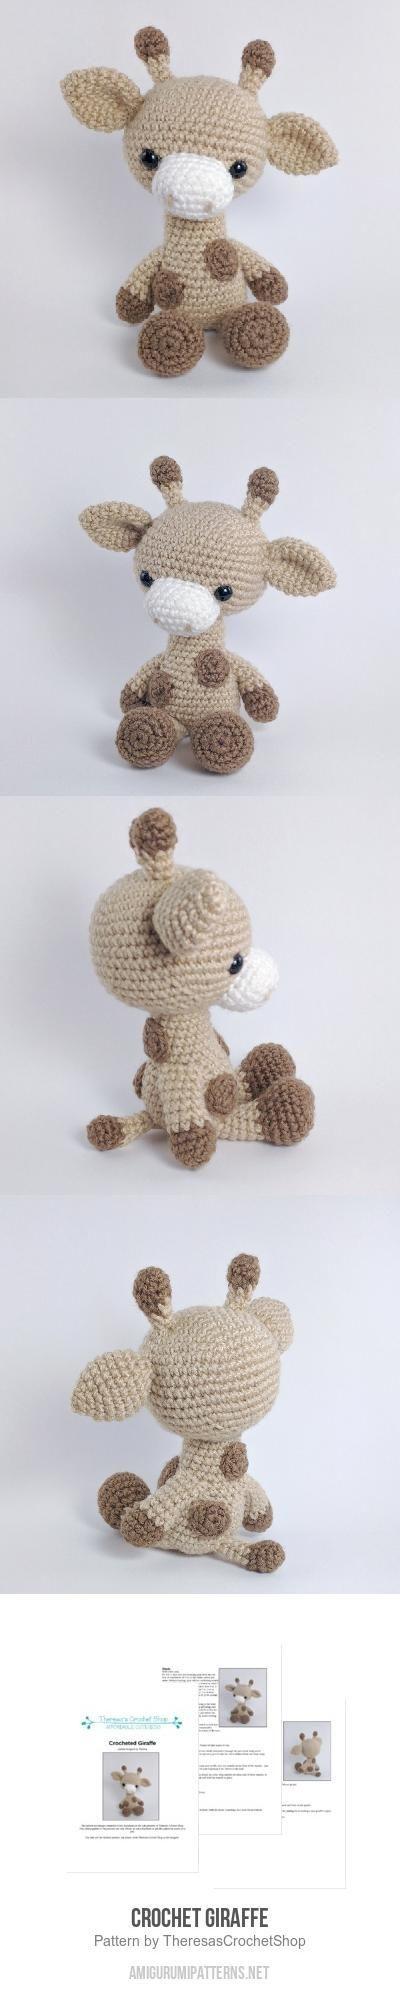 Crochet Giraffe Amigurumi Pattern by dominique | craft ideas ...